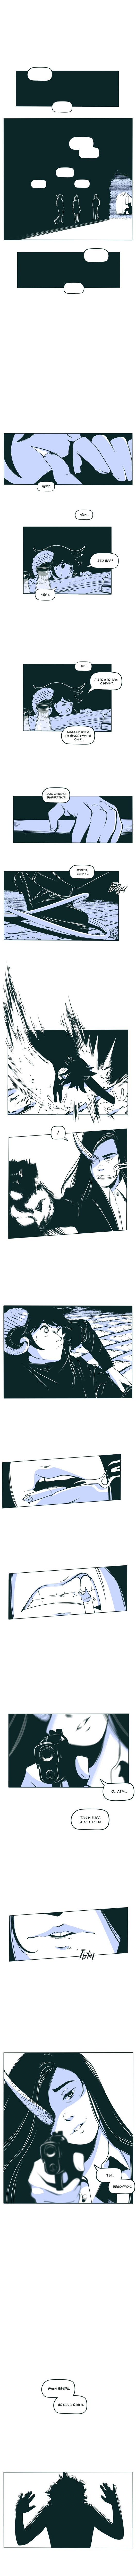 https://r1.ninemanga.com/comics/pic2/0/33536/420921/153443774547.jpg Page 3